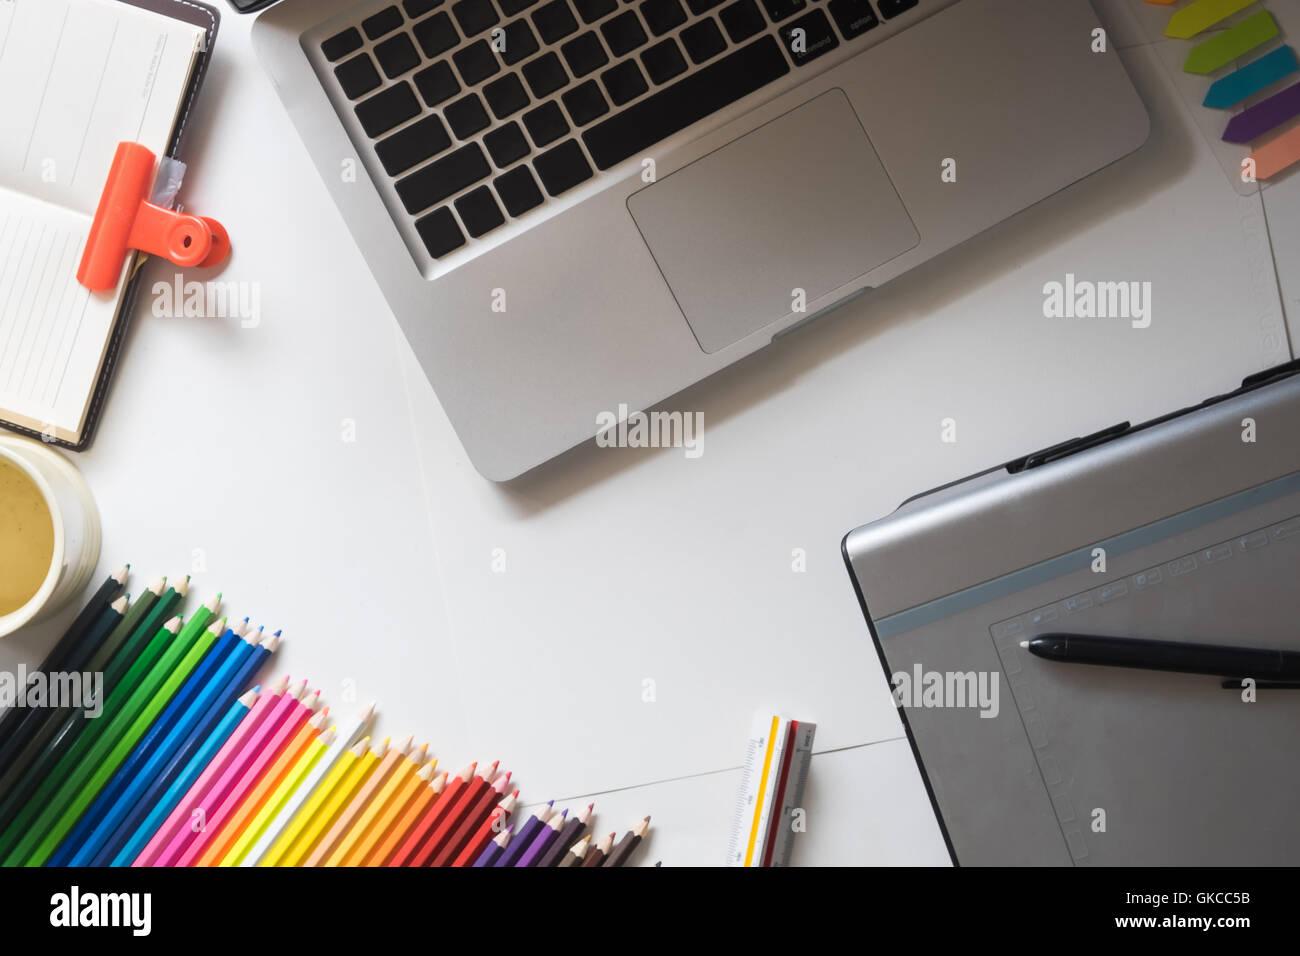 Graphic Design or Designer Creative Graphic Desk Table Dark Tone. - Stock Image